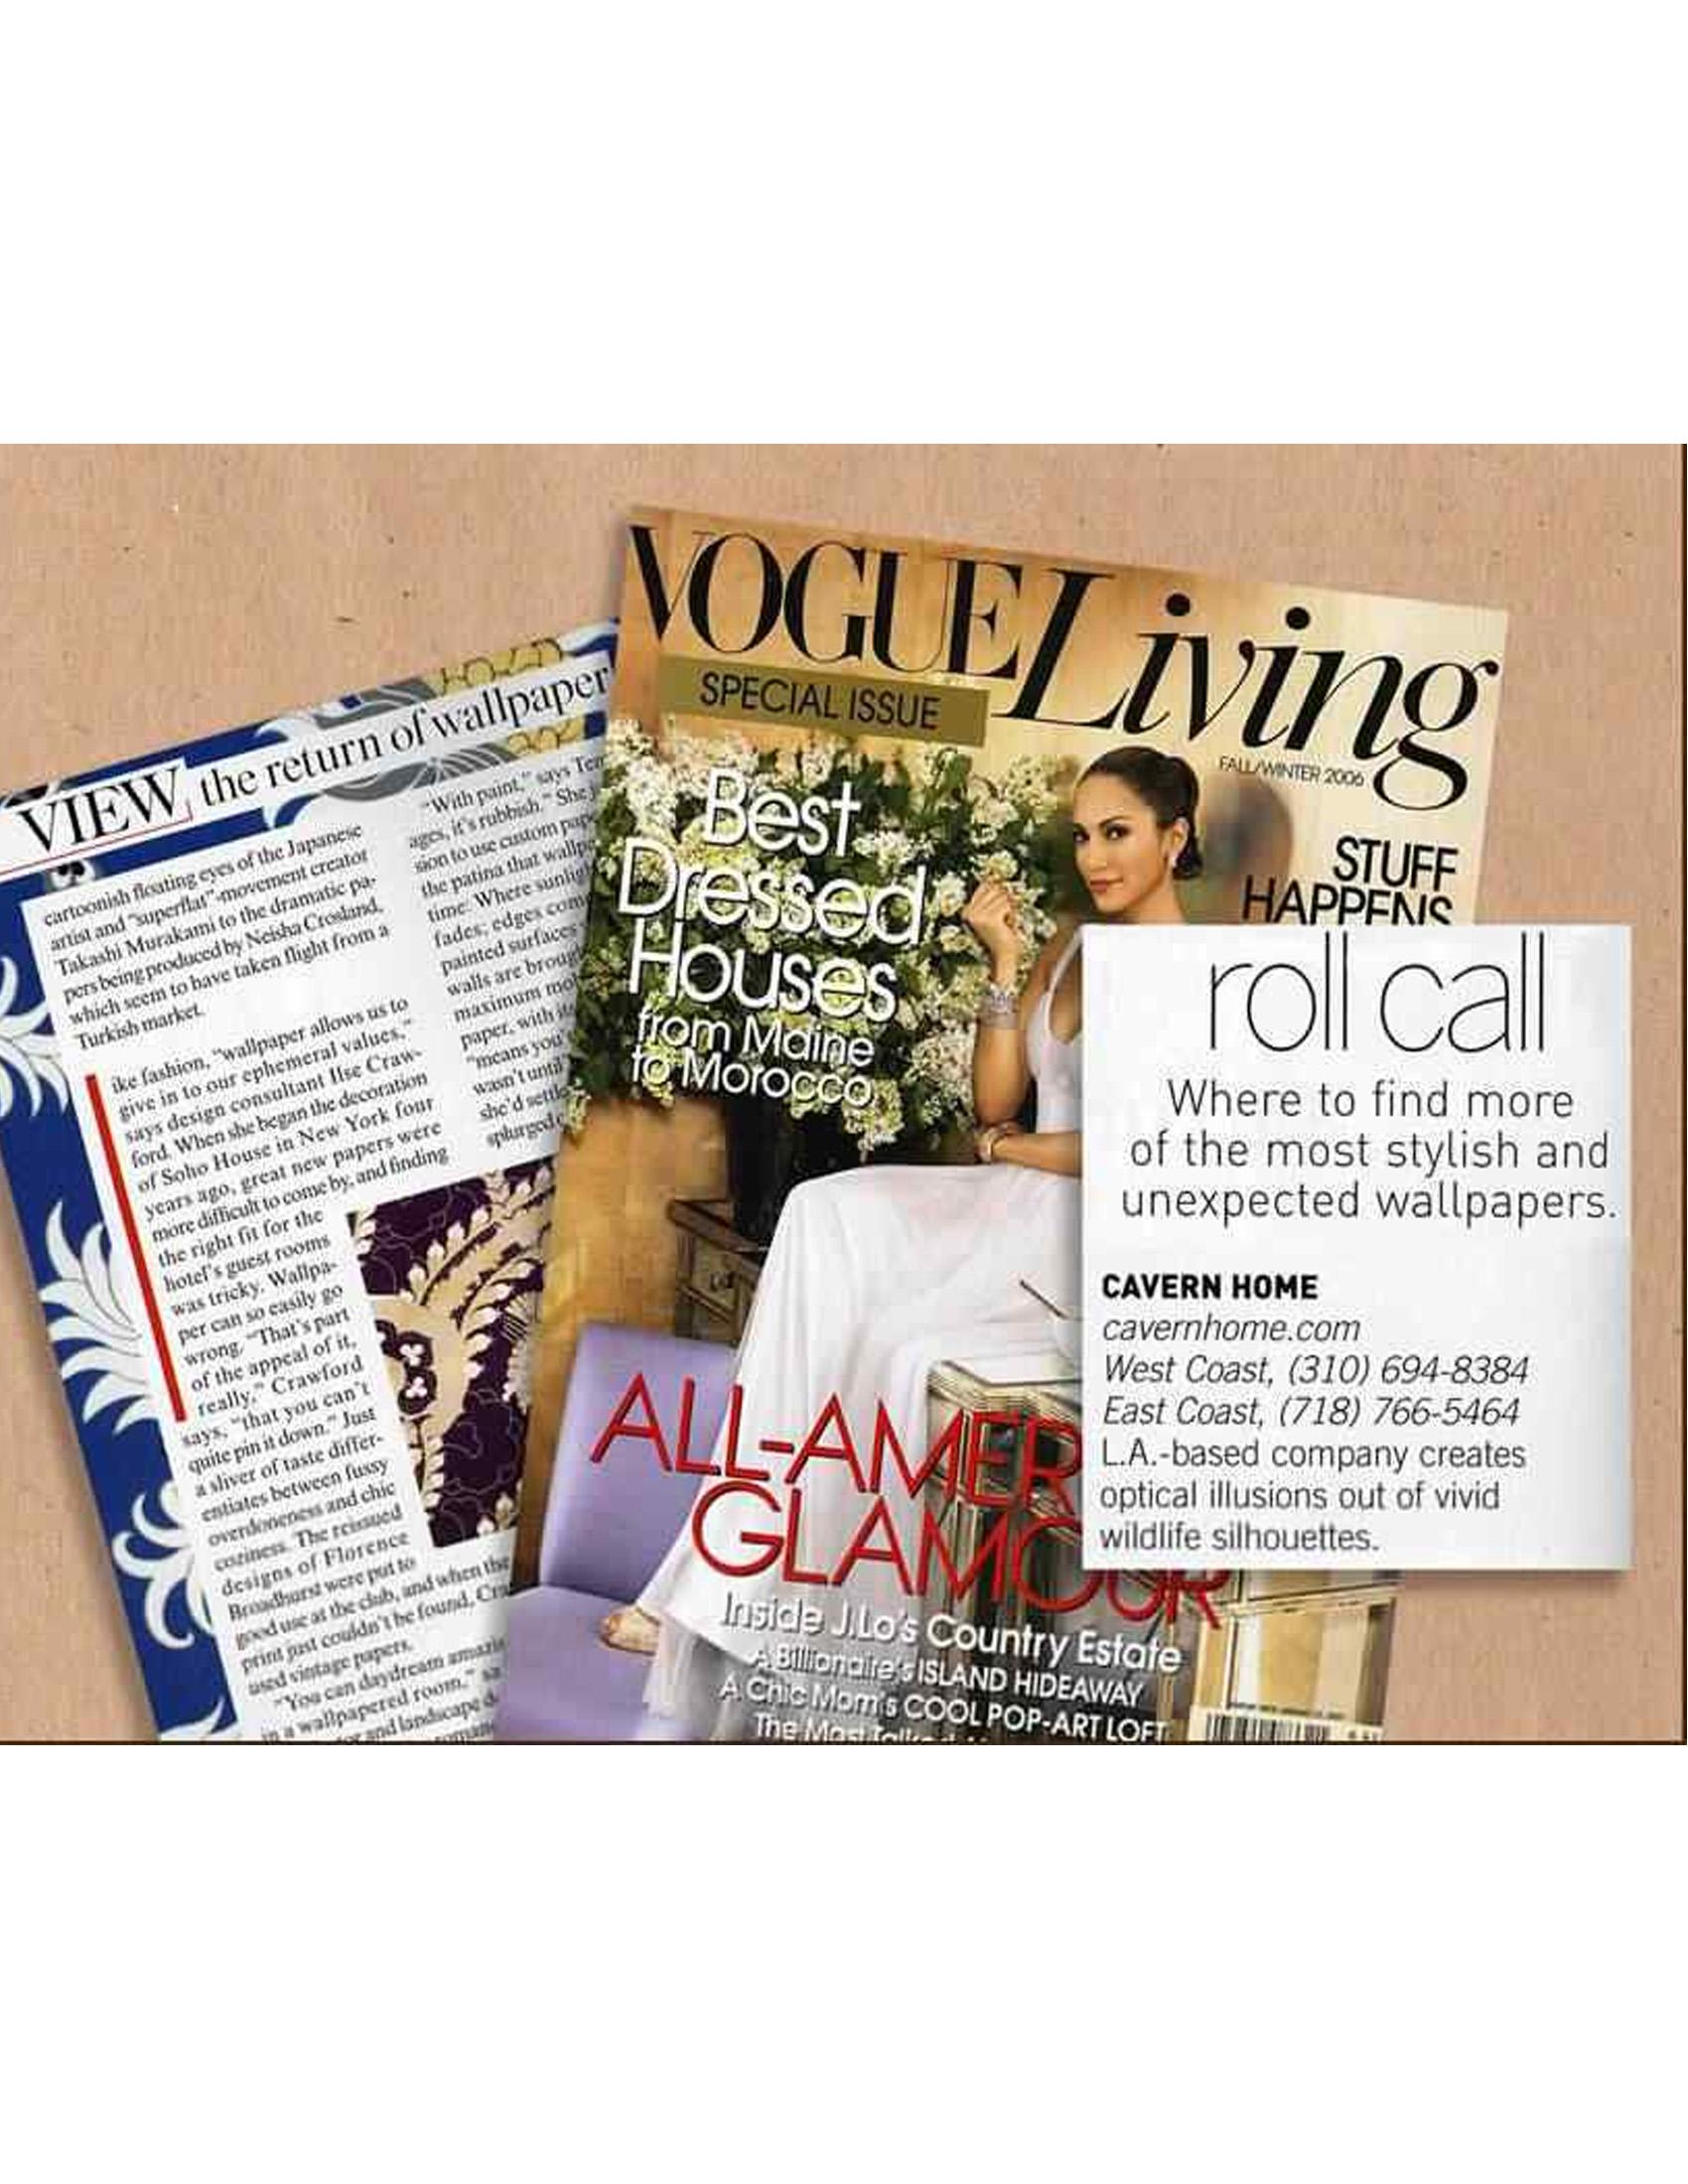 Vogue Living Fall/Winter 2006